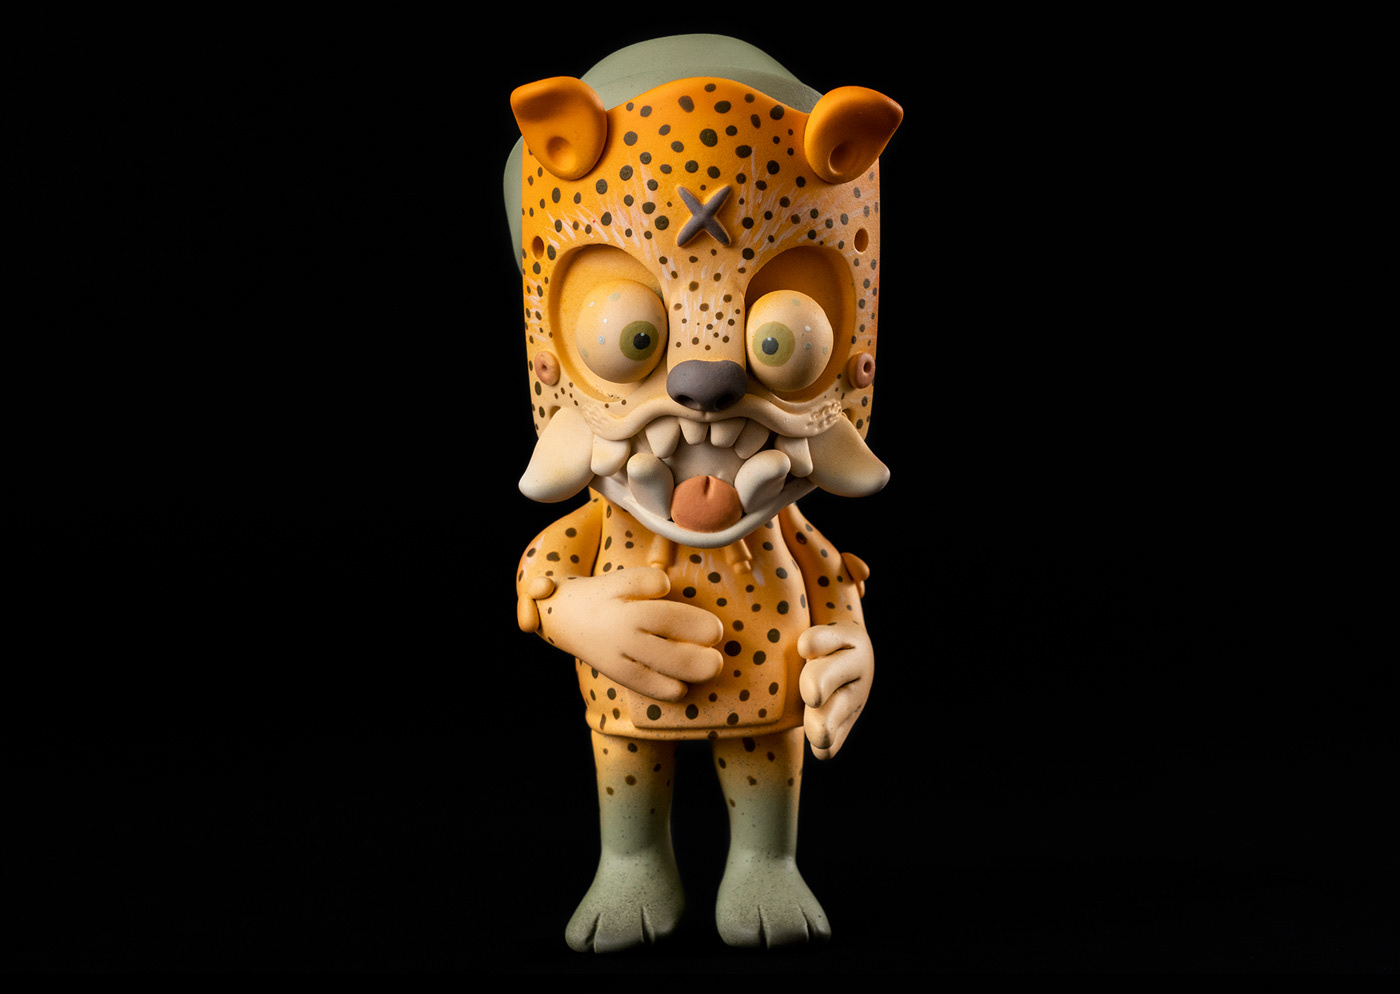 arttoy color designertoy jaguar mexicantoy modeling sculptor toy vinyl toy